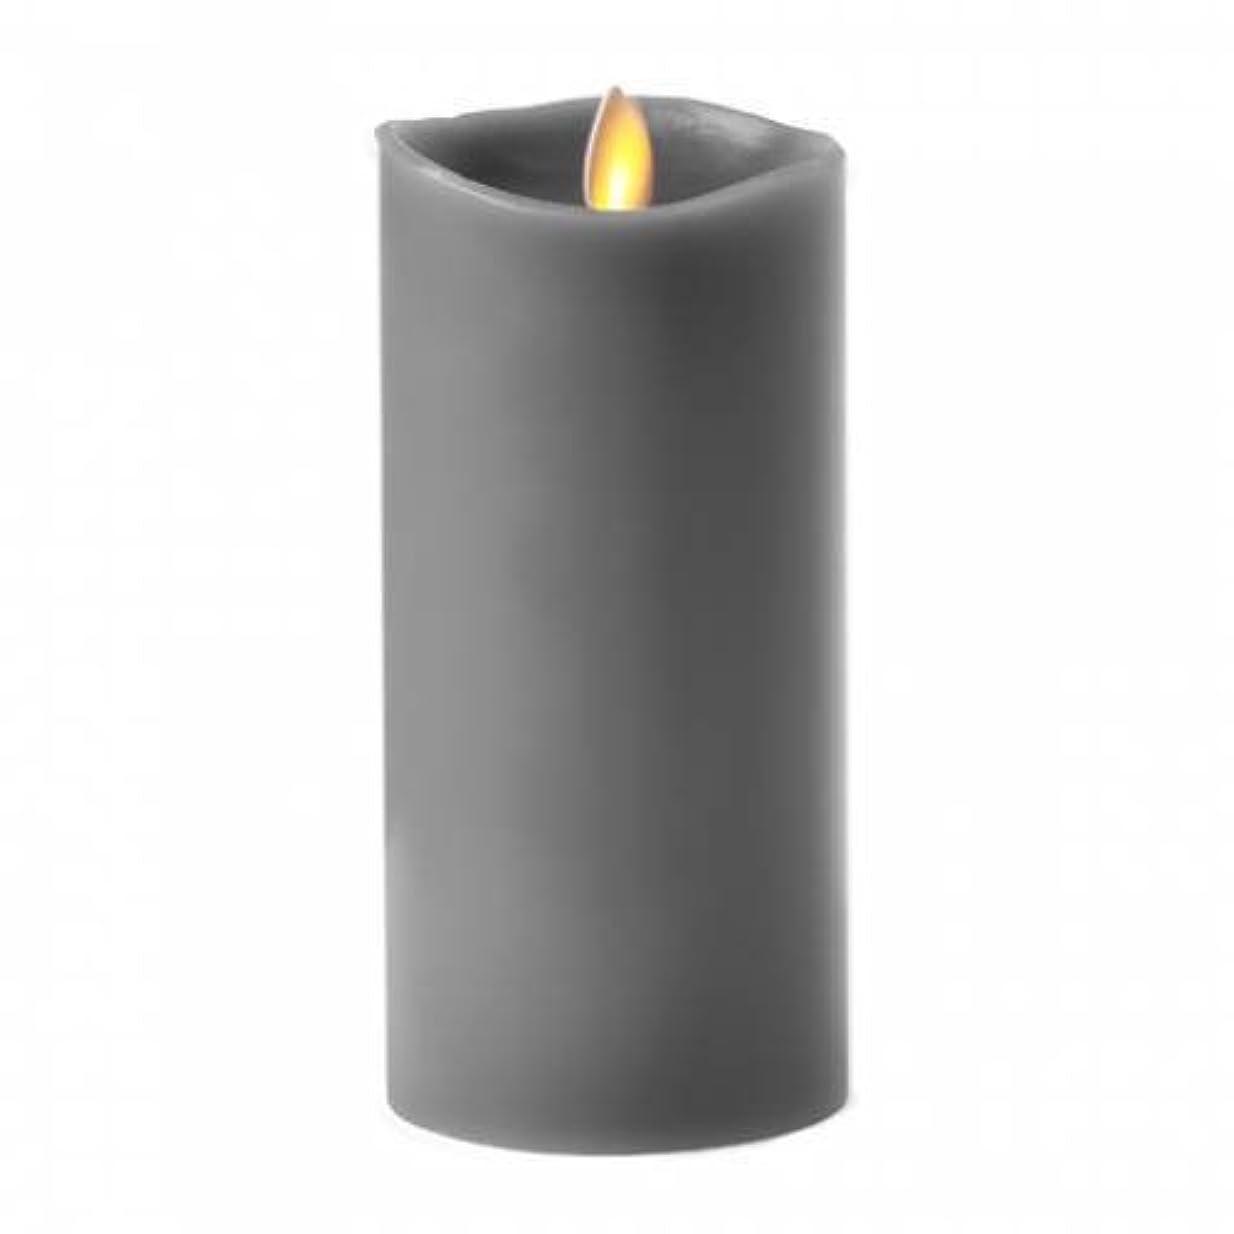 接地病弱区画Luminara 15cm Gravel Grey Pillar Candle